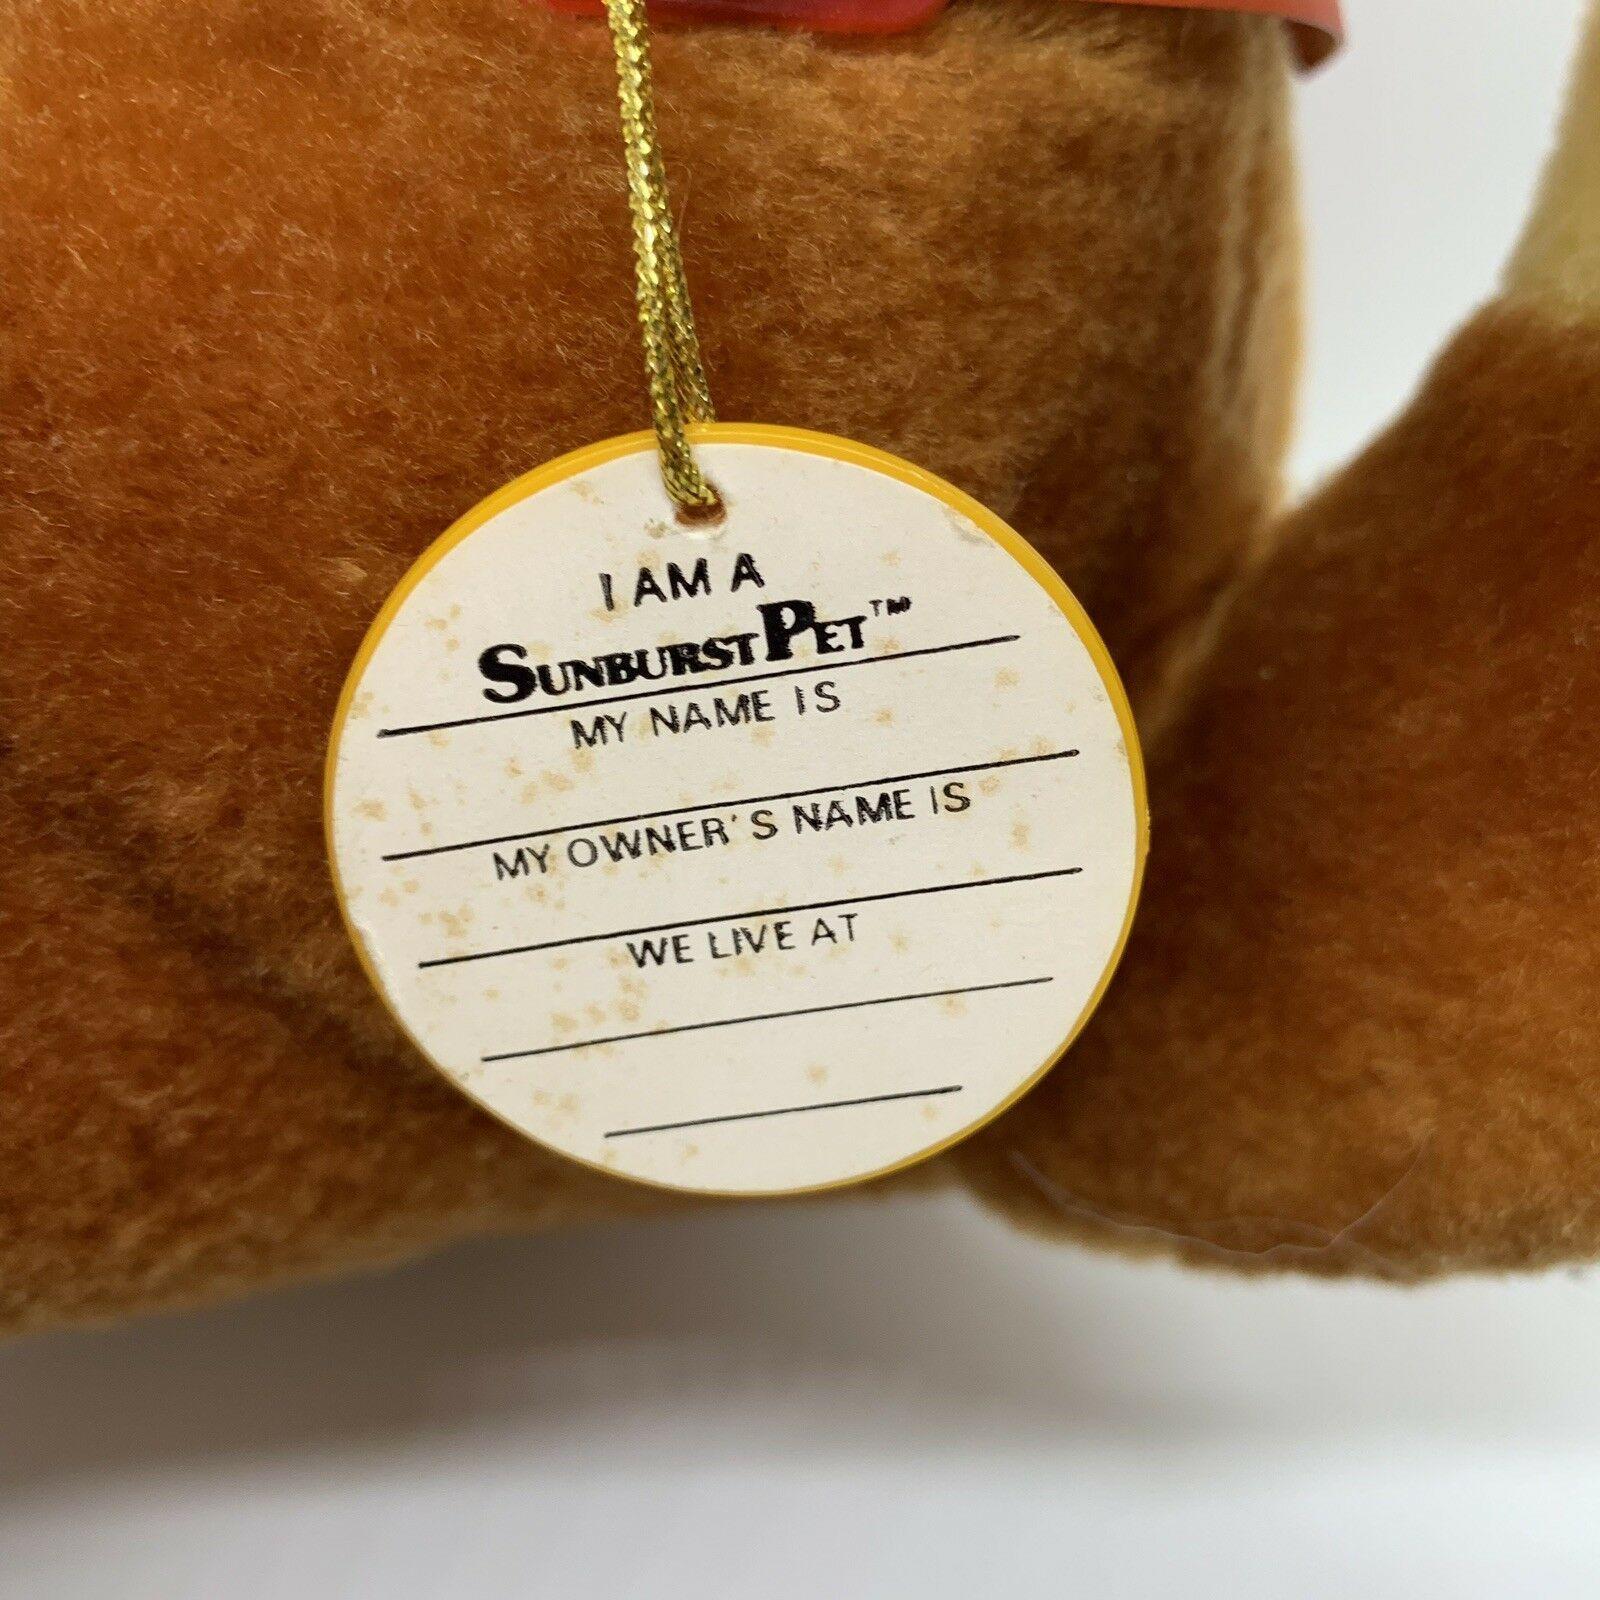 "Sunburst Pets 1983 Vintage Plush Brown Dog Commonwealth Vtg Stuffed Animal 13"" image 7"